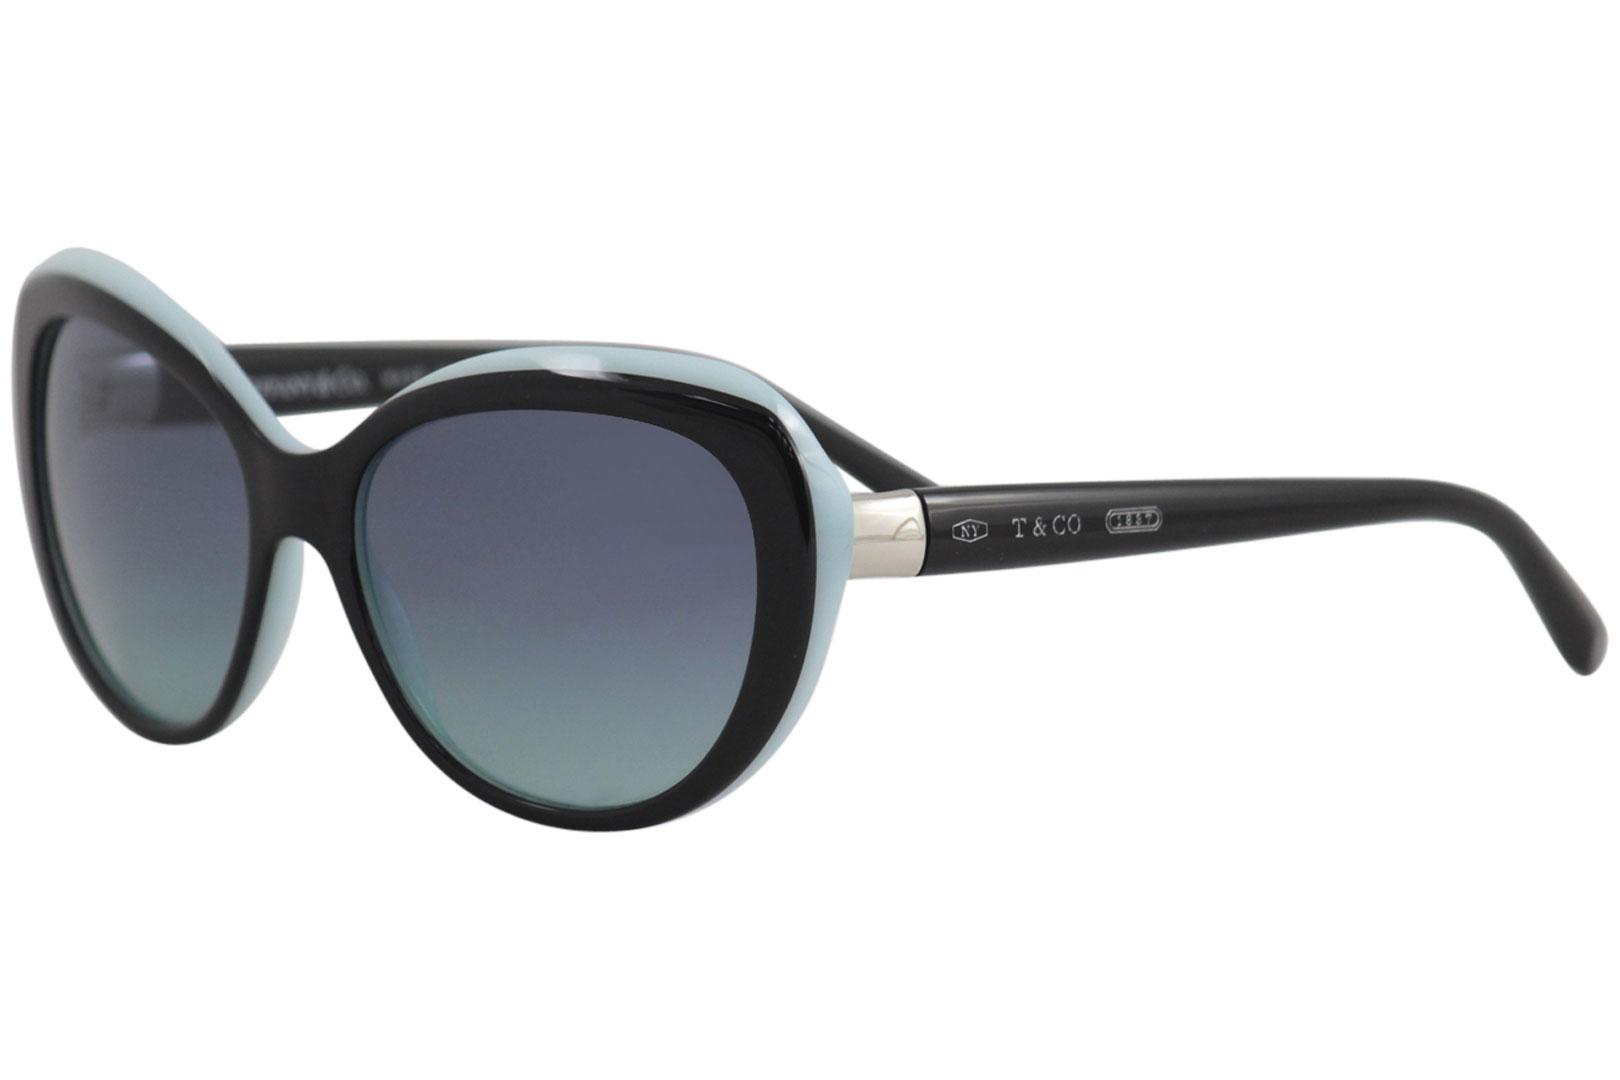 d08c6ecf34ebd Tiffany Co. Mujer   TF4122 TF 4122 8055 9S Negro Azul Gafas de sol ...